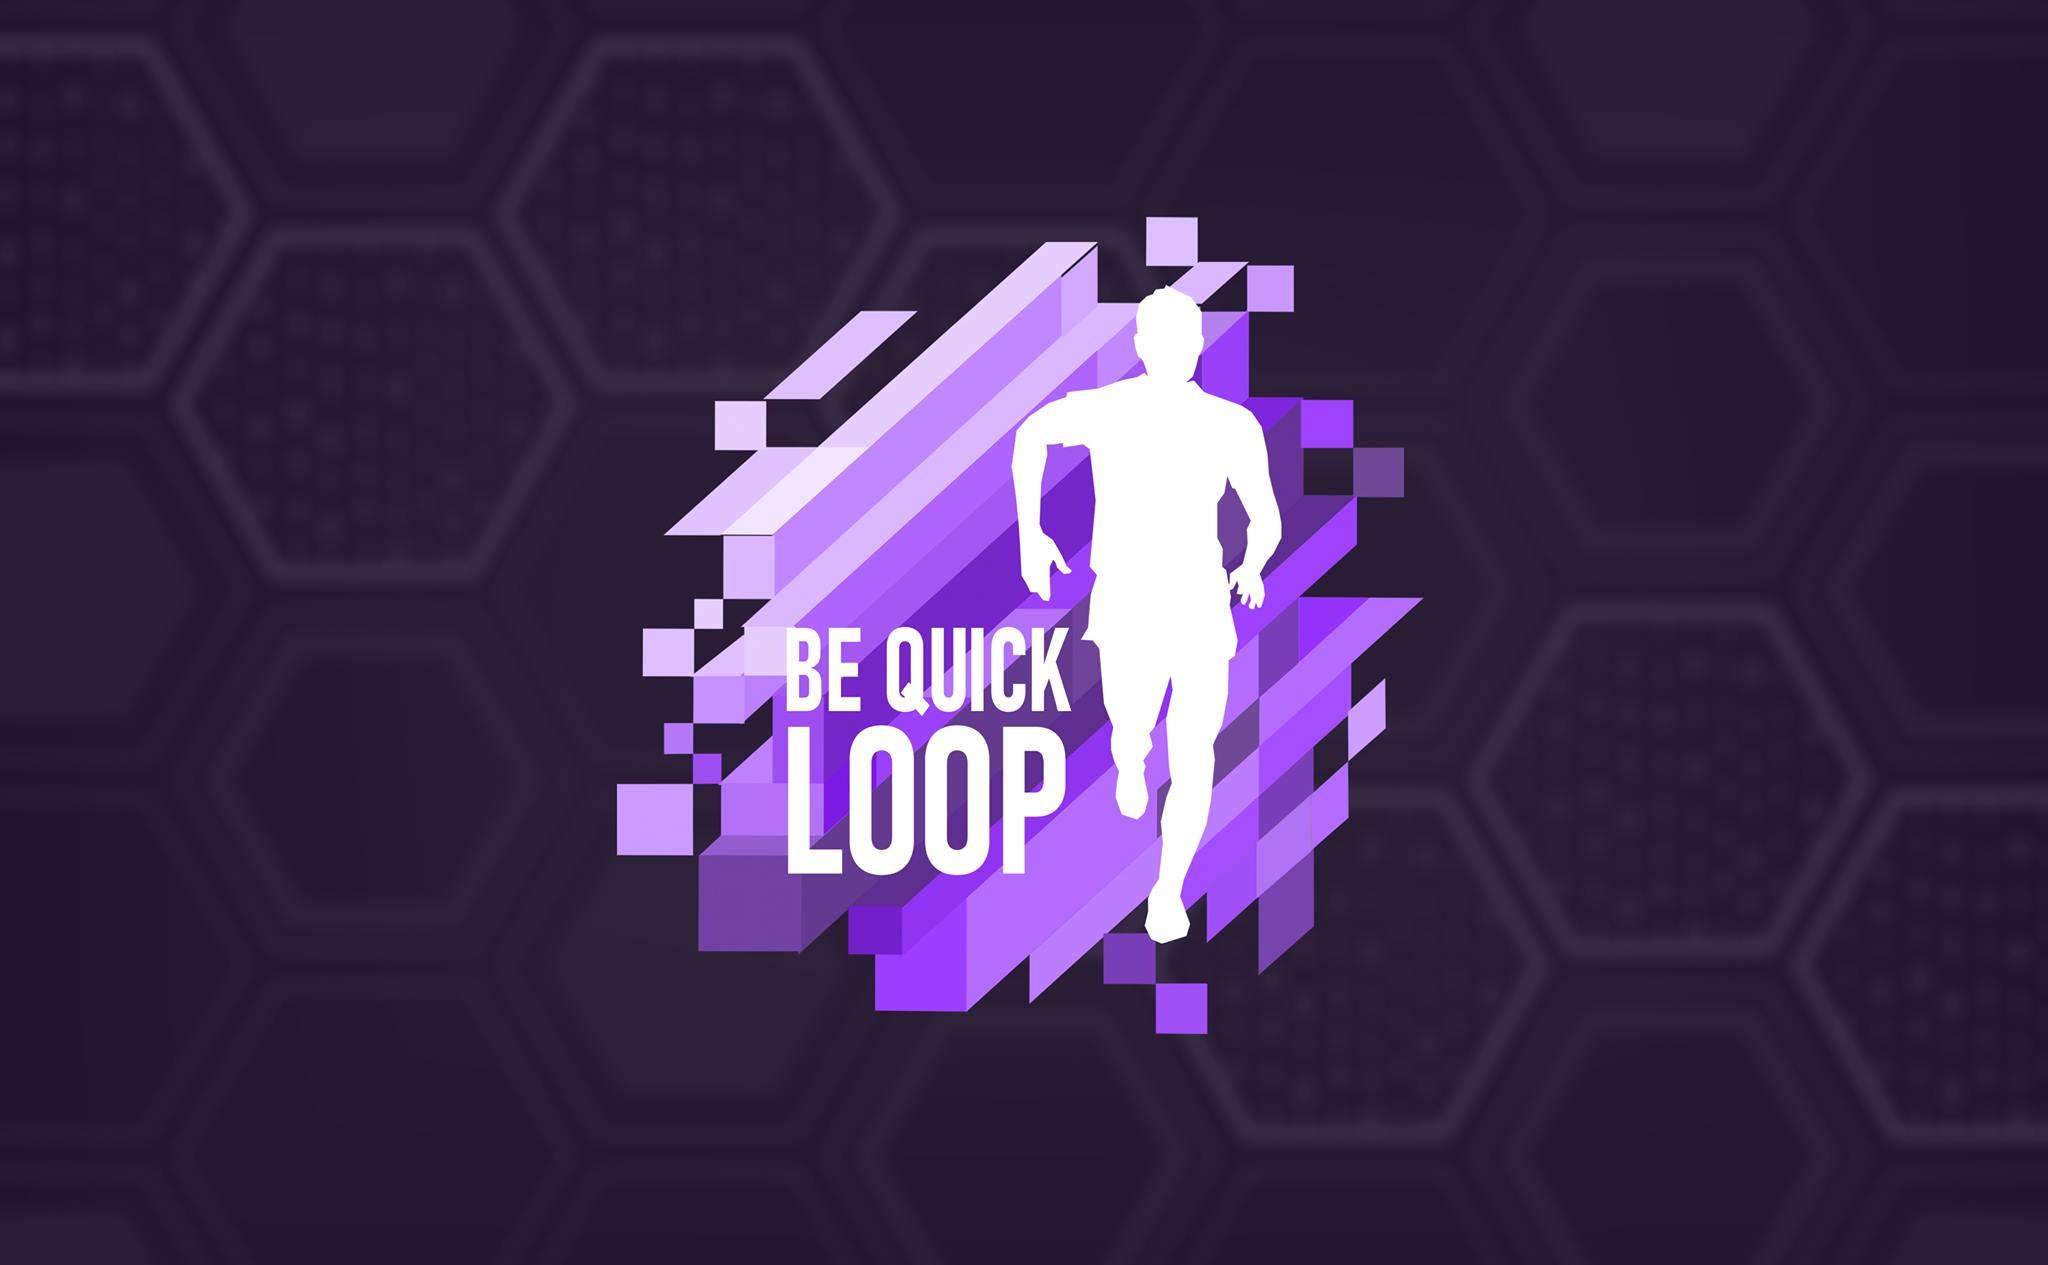 Be Quick Loop 2021